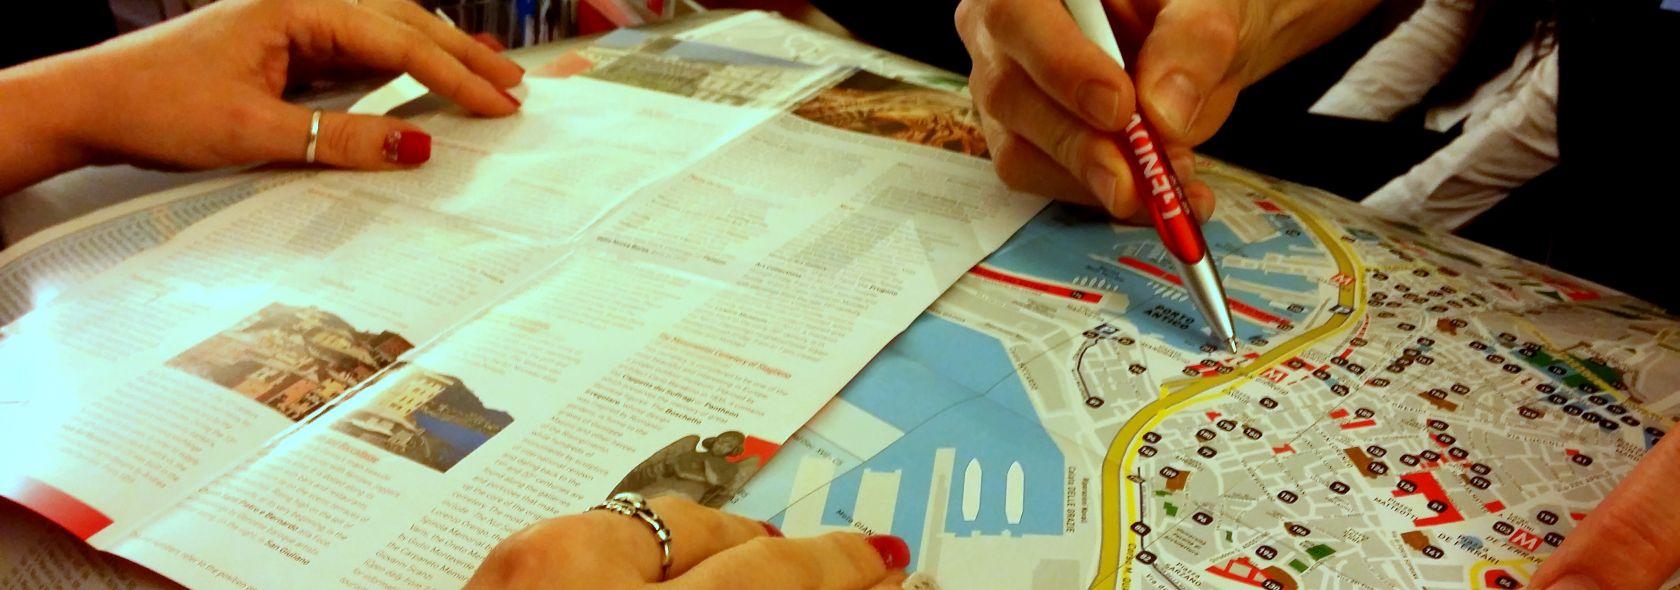 Uffici di Accoglienza e Informazione Turistica IAT